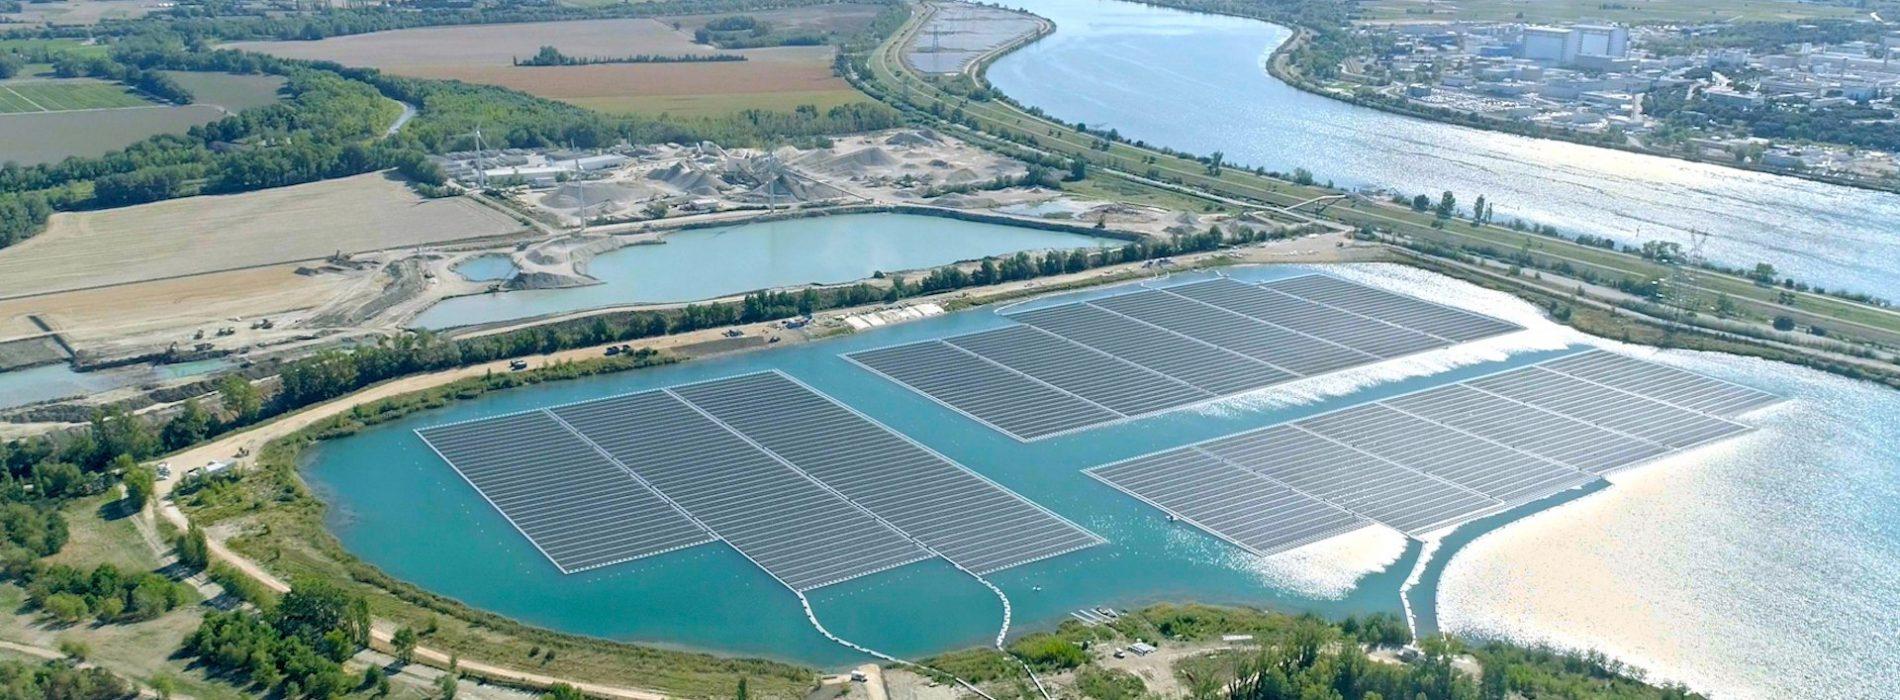 Kenya: KenGen valuta il solare galleggiante per i bacini di 3 dighe